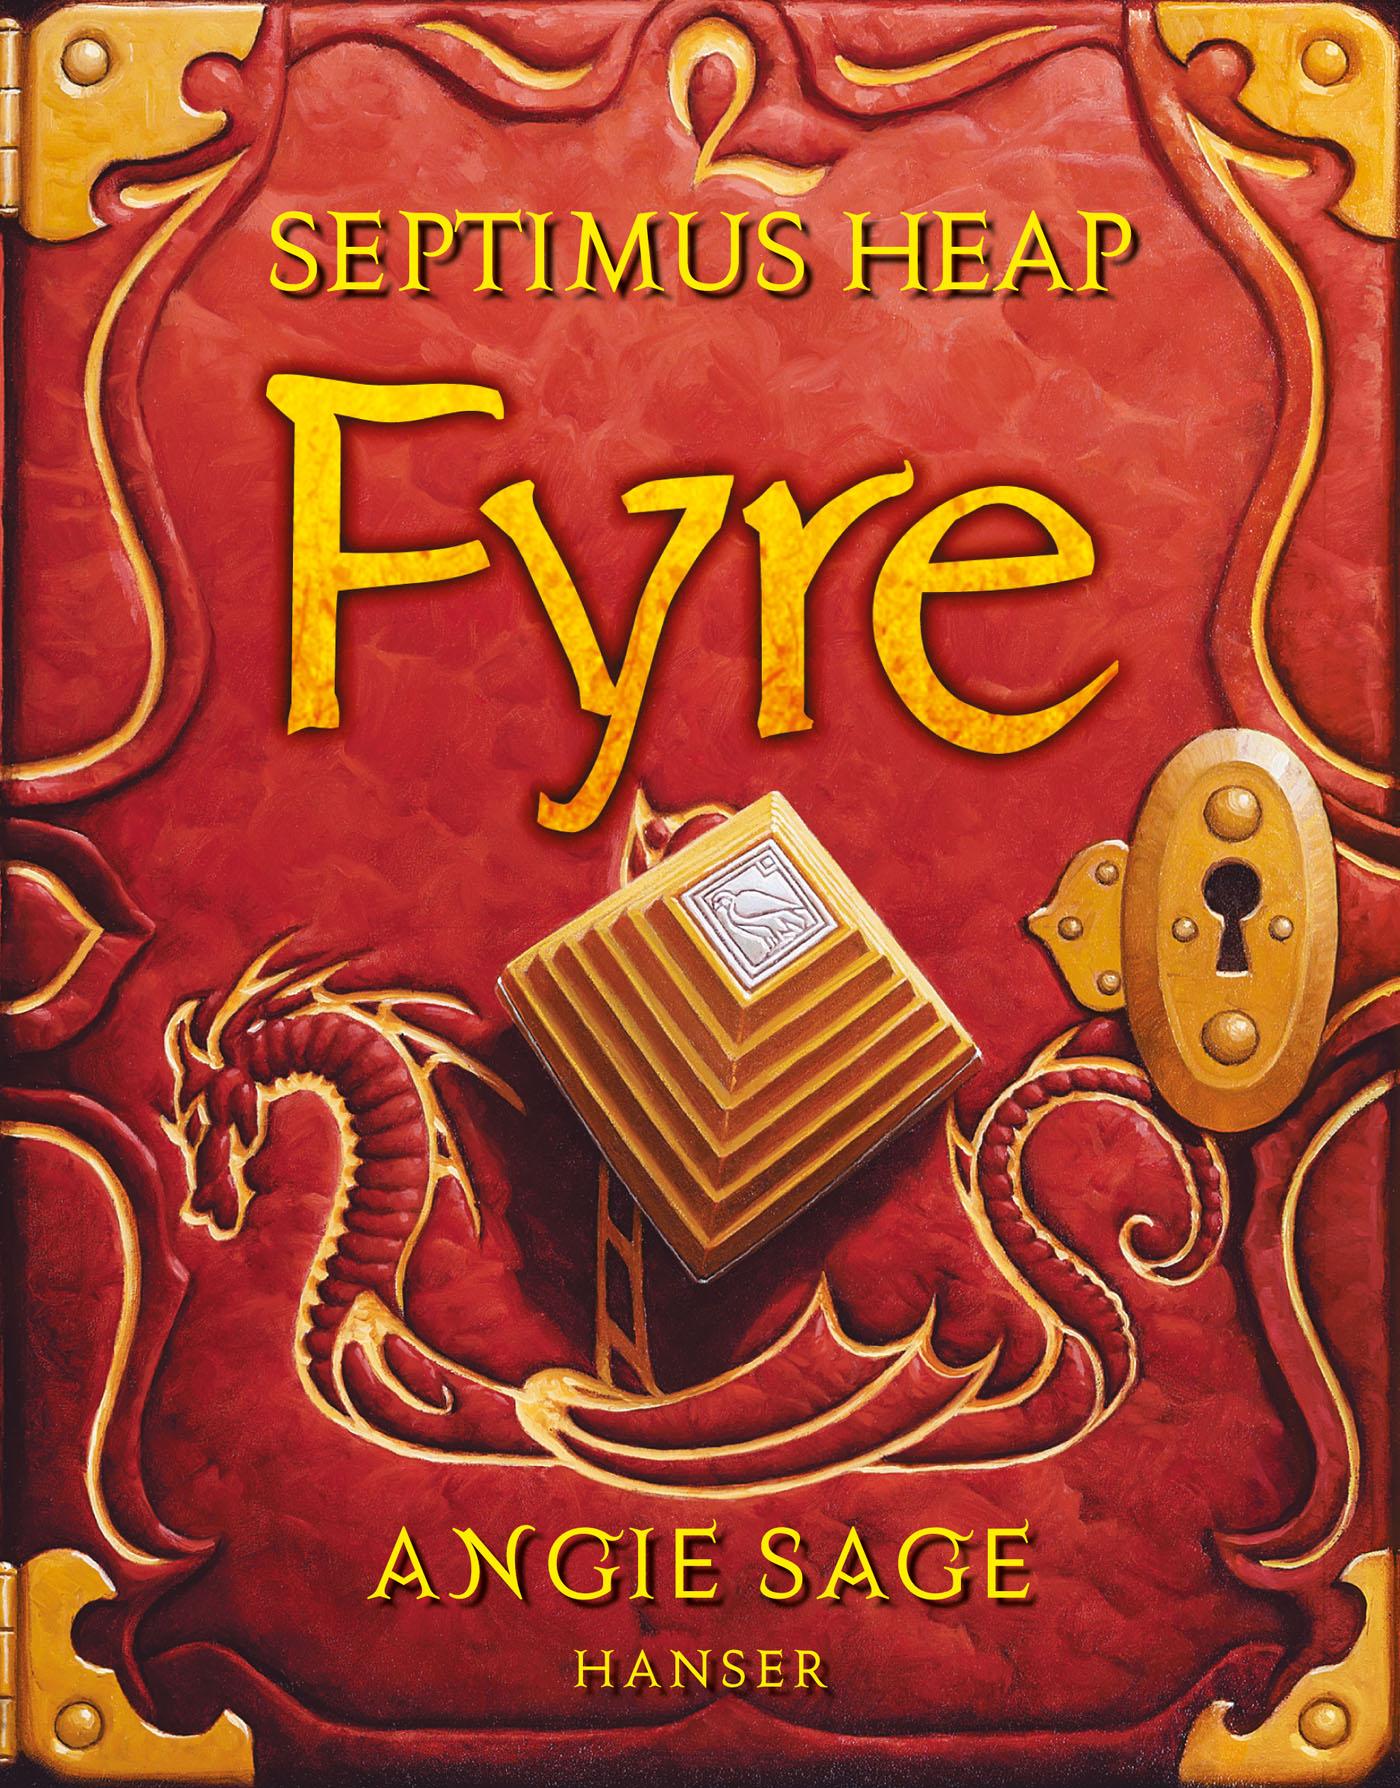 Flyte Book Summary